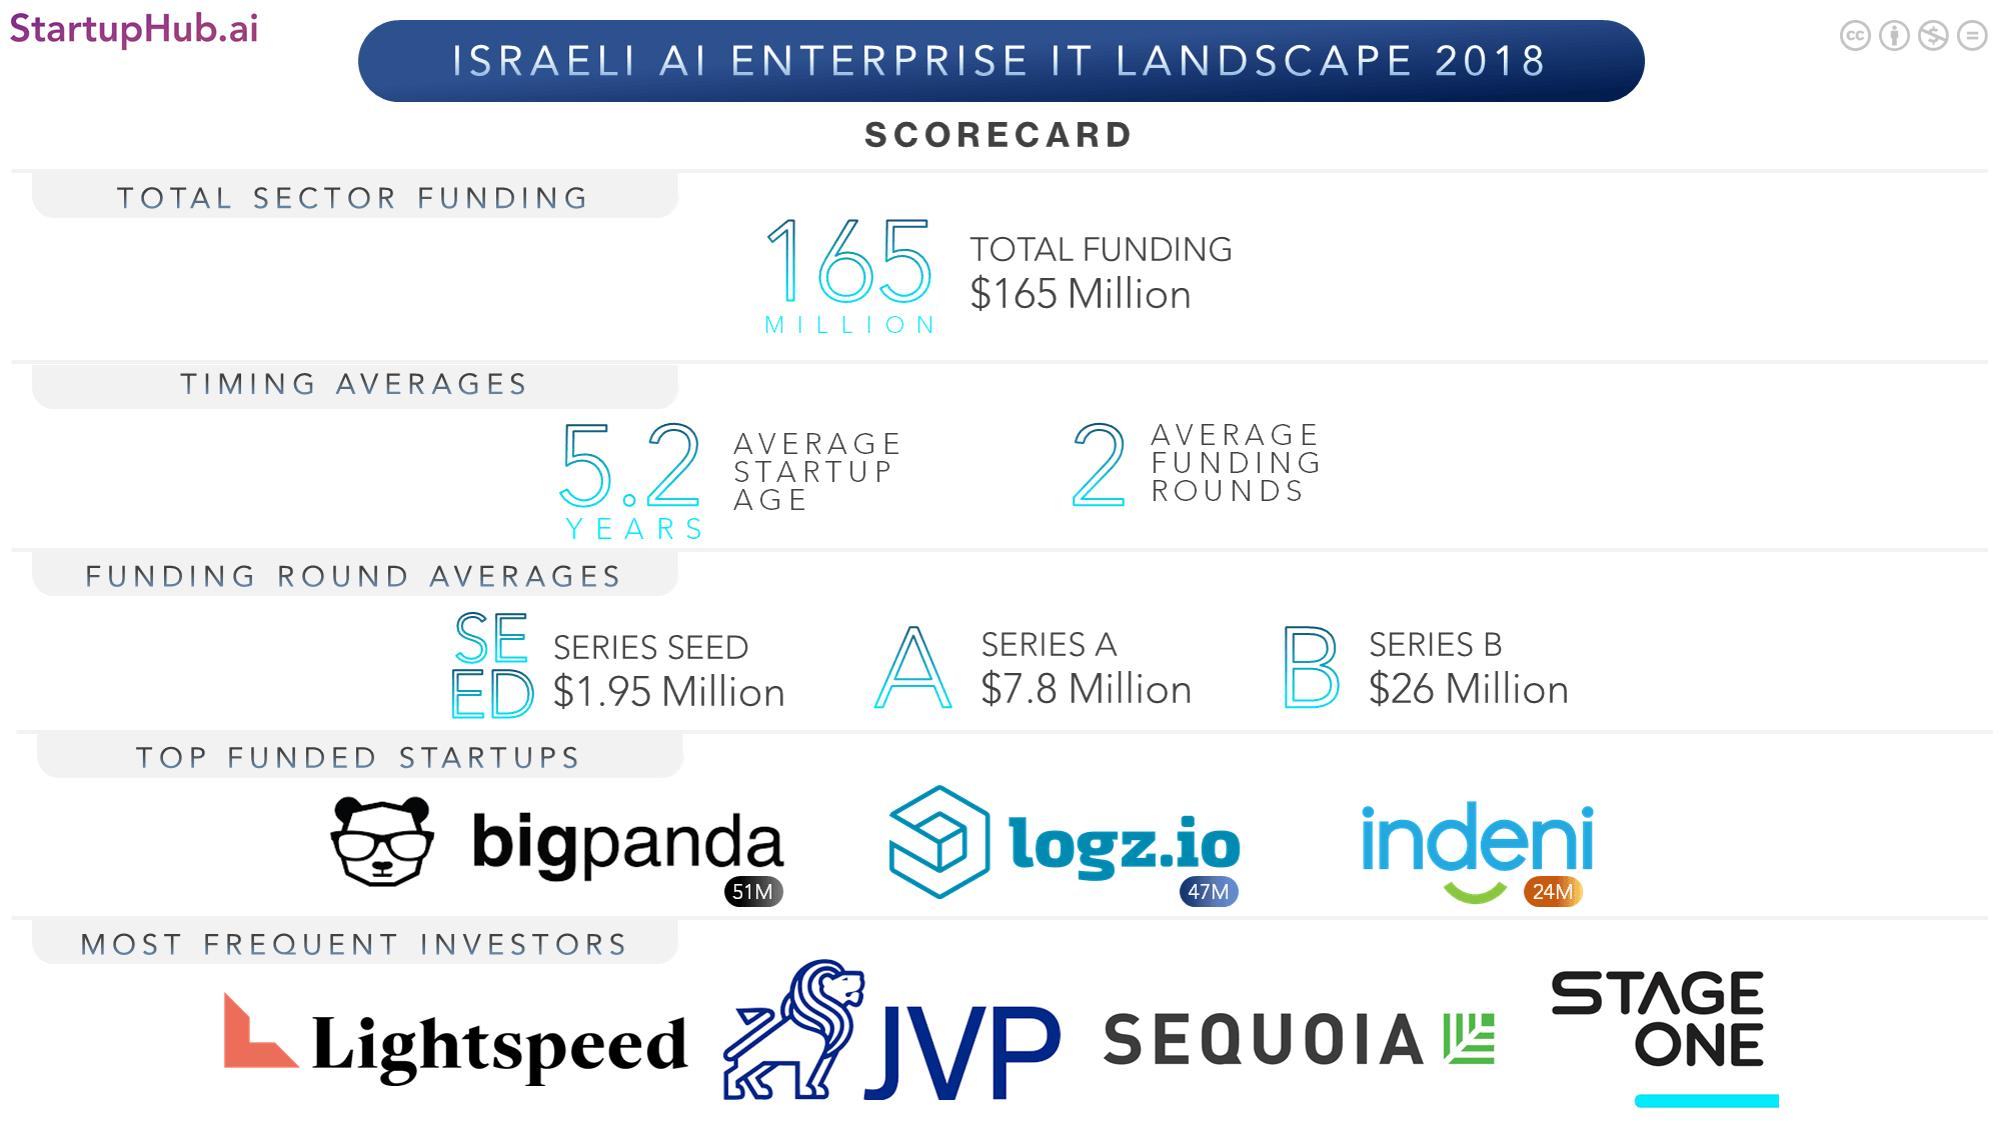 Israel's AI Enterprise IT Startup Landscape 2018 - StartupHub ai